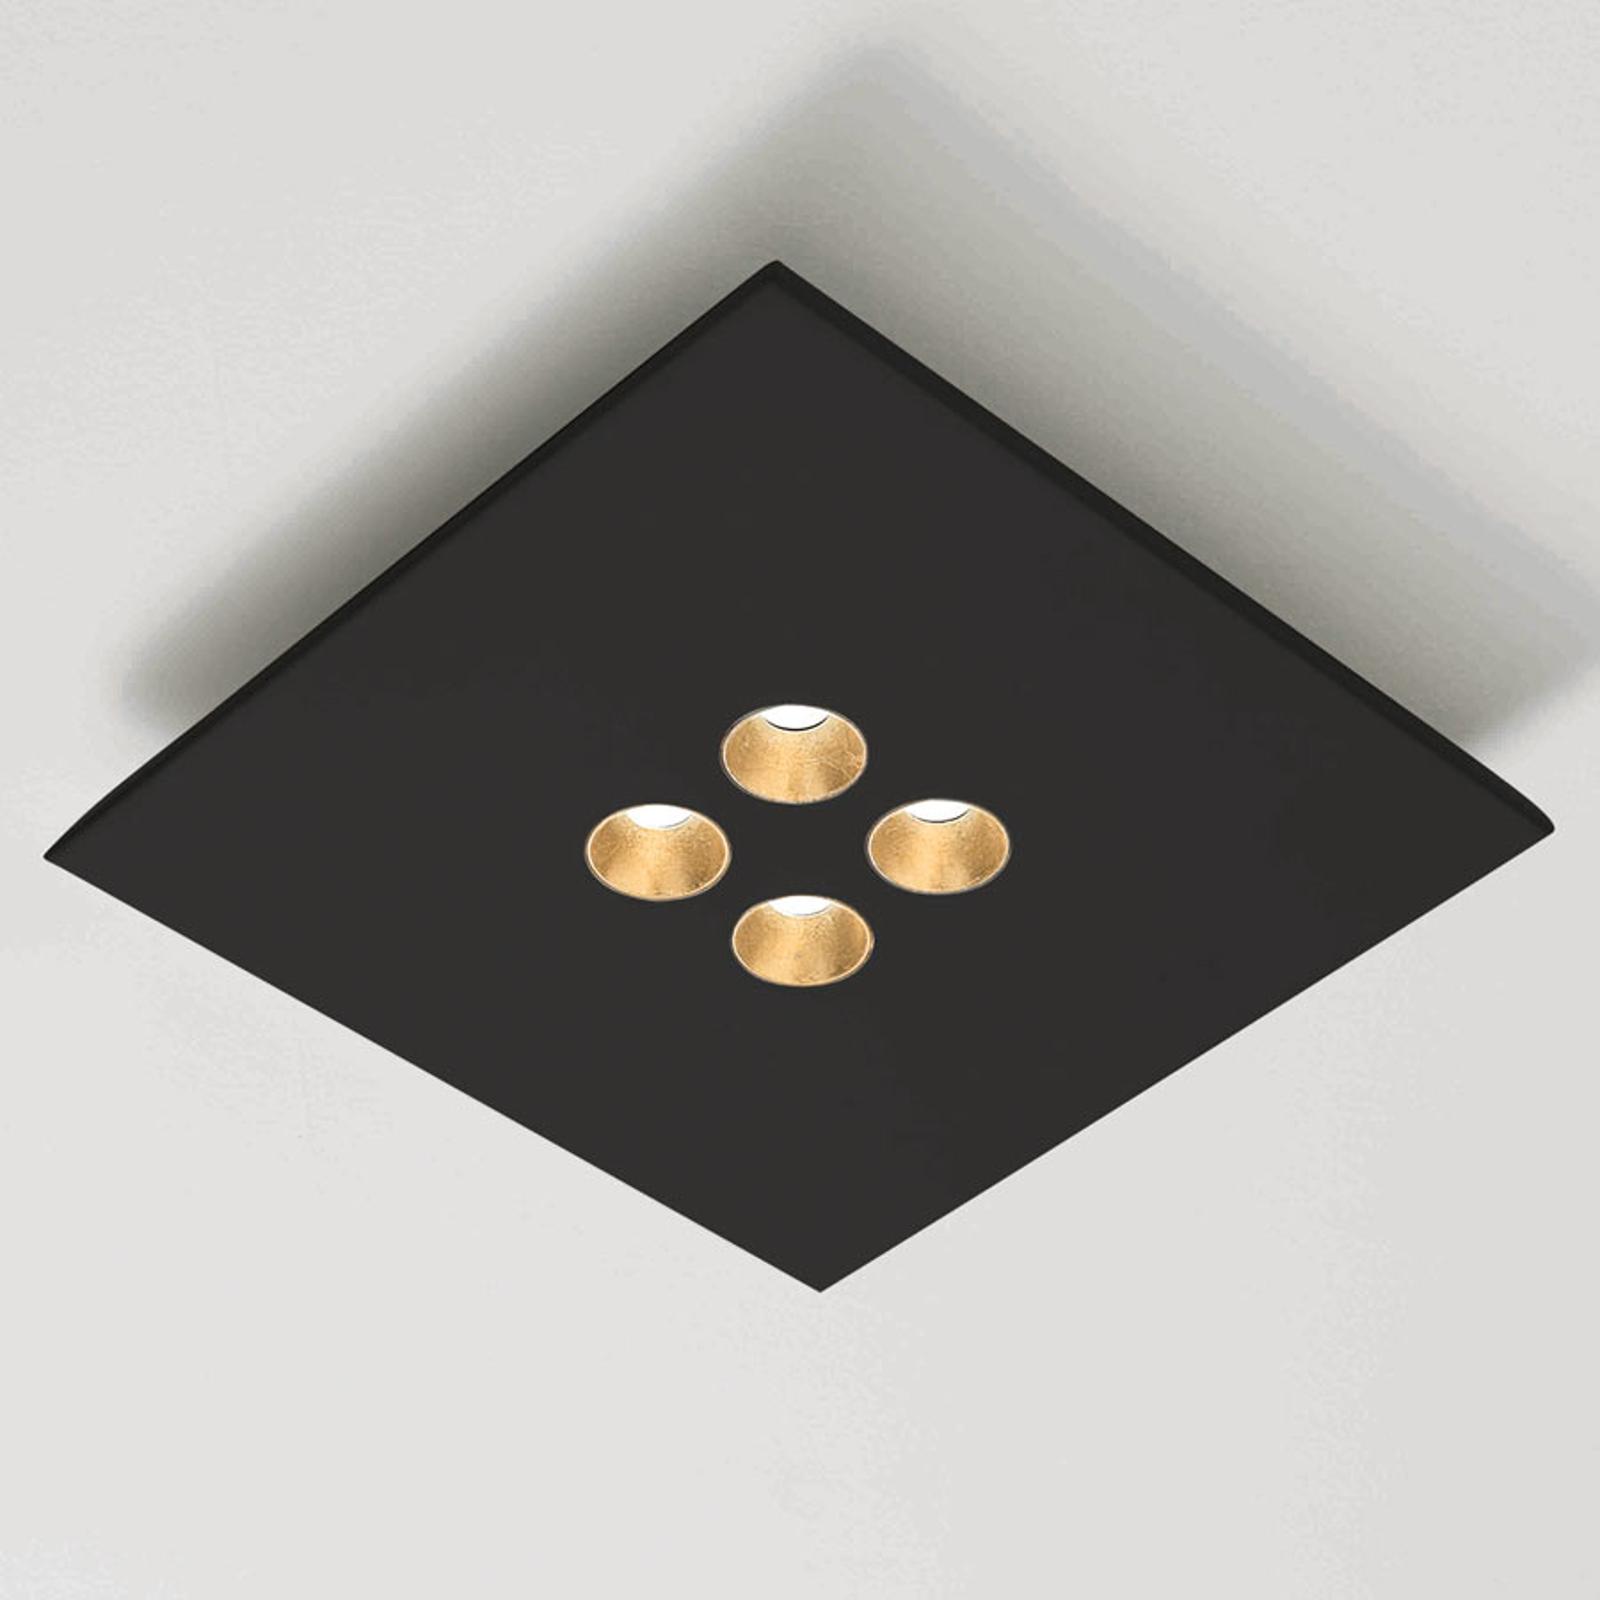 ICONE Confort - lampa sufitowa LED czarna